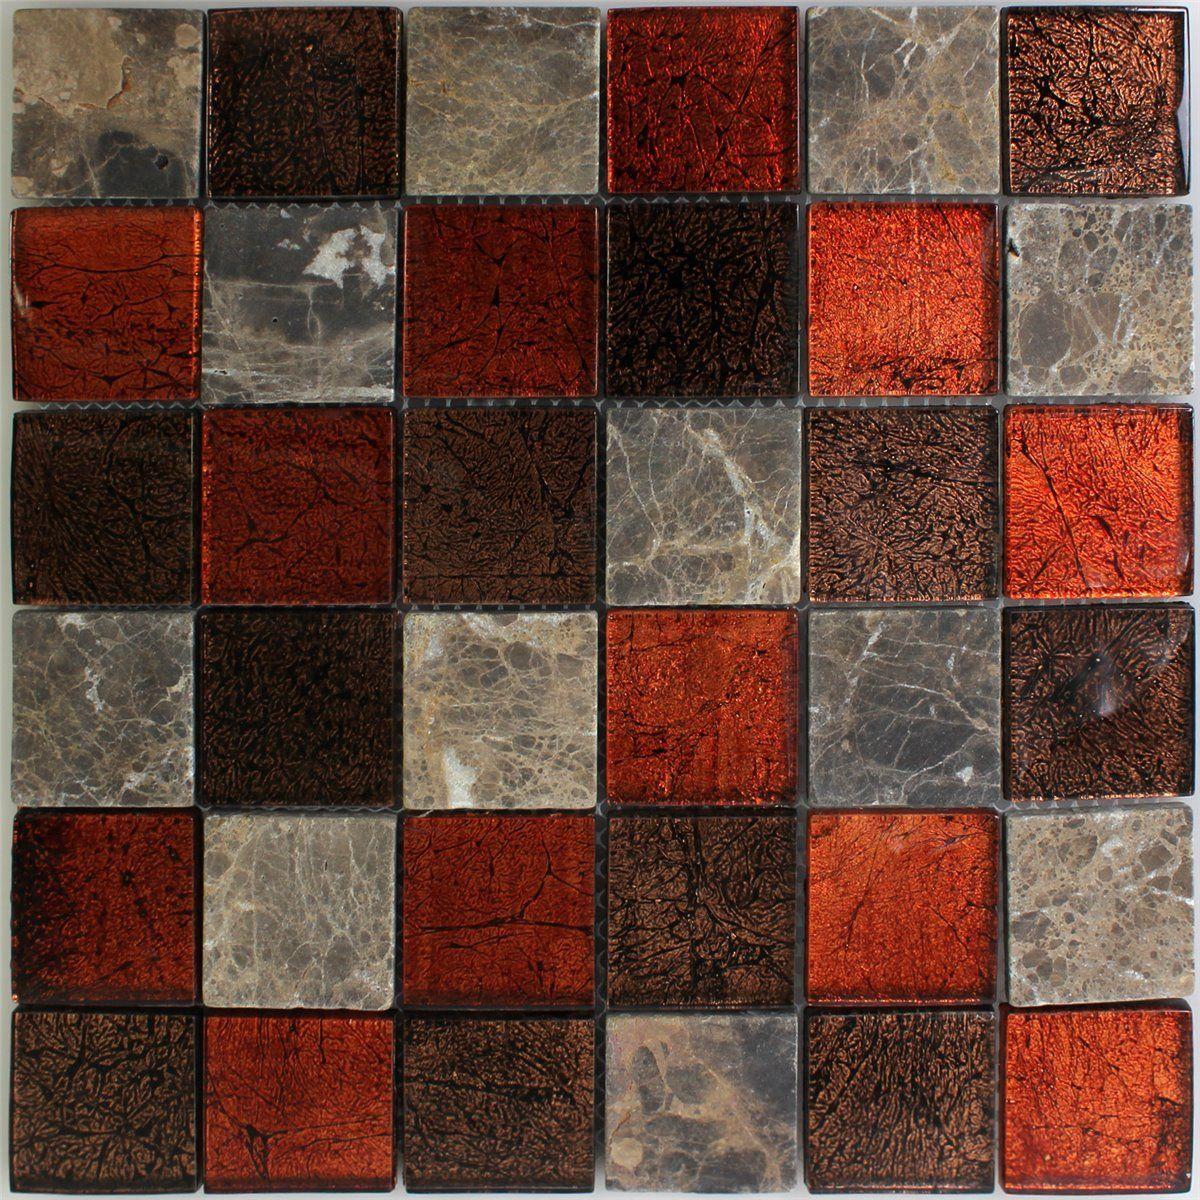 Naturstein glas mosaik fliesen rot braun 48x48x8mm home pinterest - Mosaik fliesen braun ...